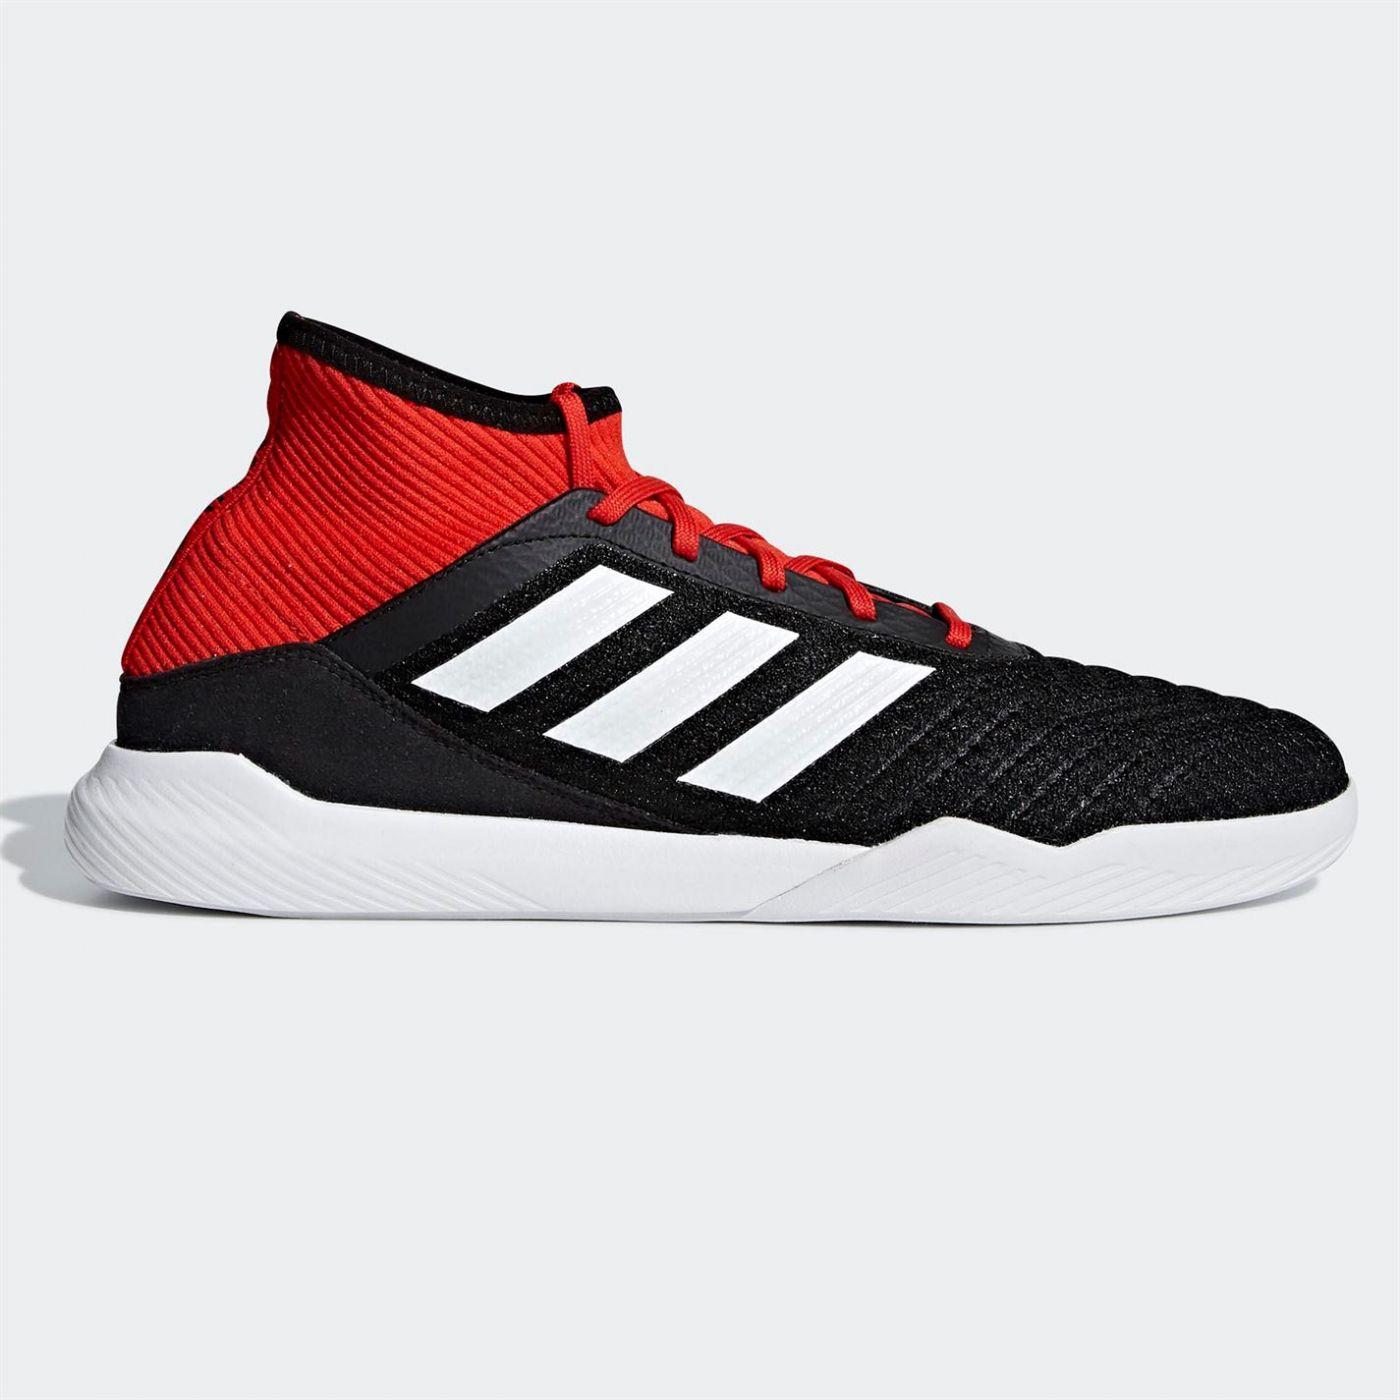 Adidas Predator Tango 18.3 Mens Trainers